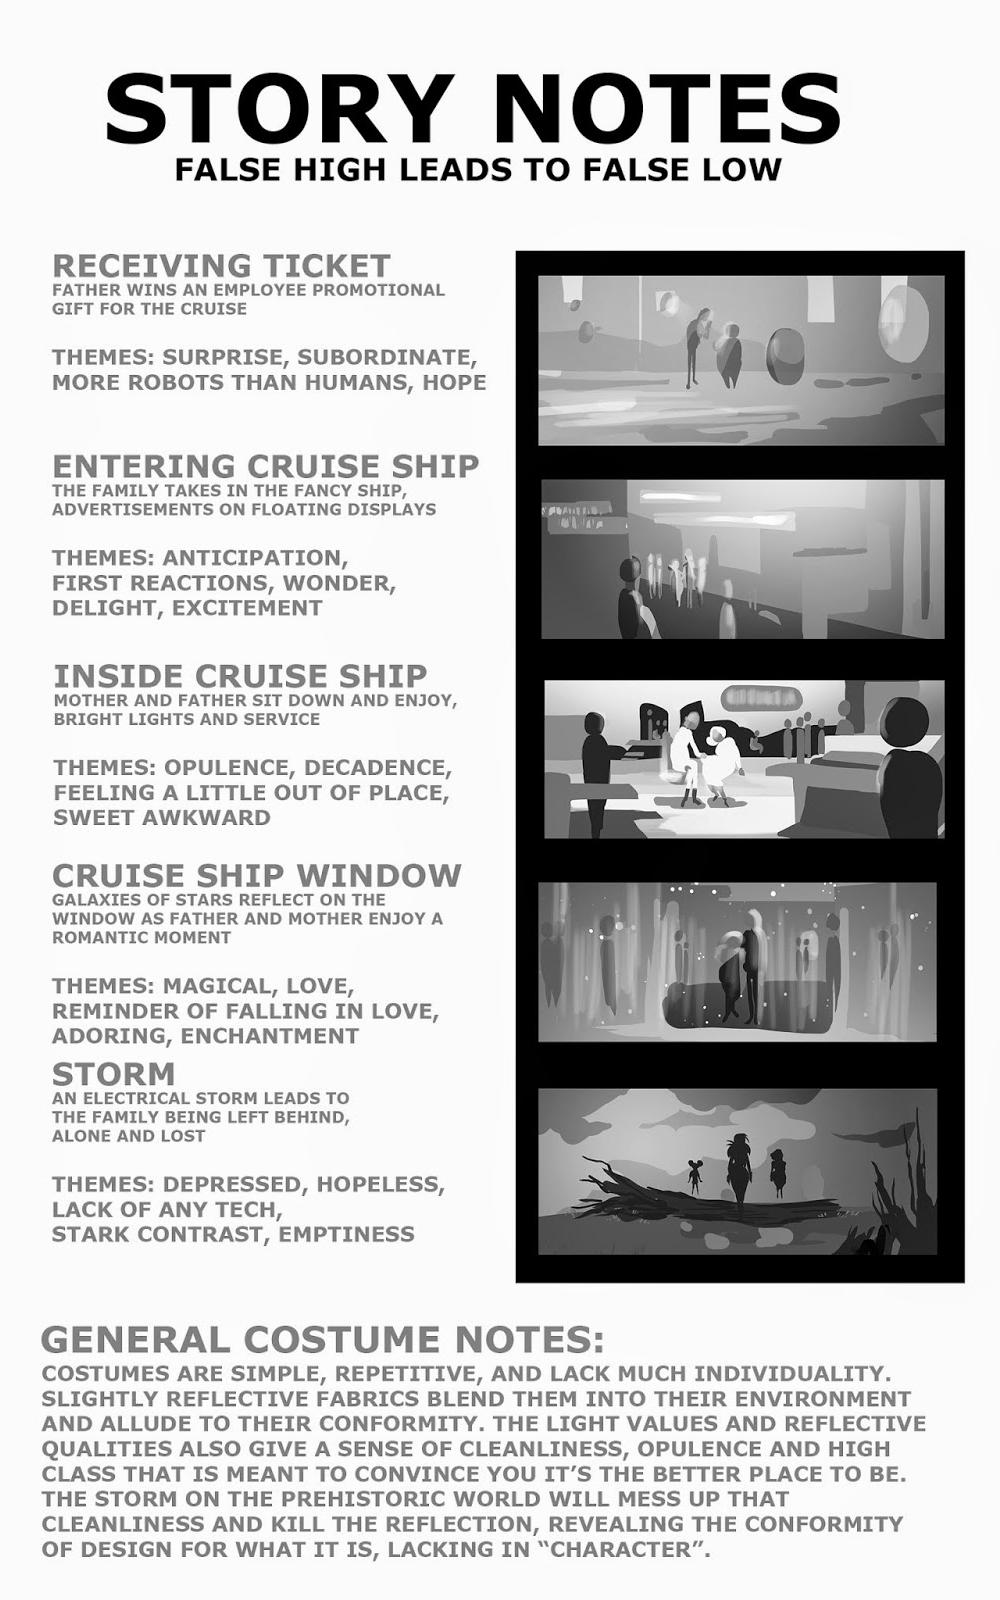 storynotes-cruise.jpg